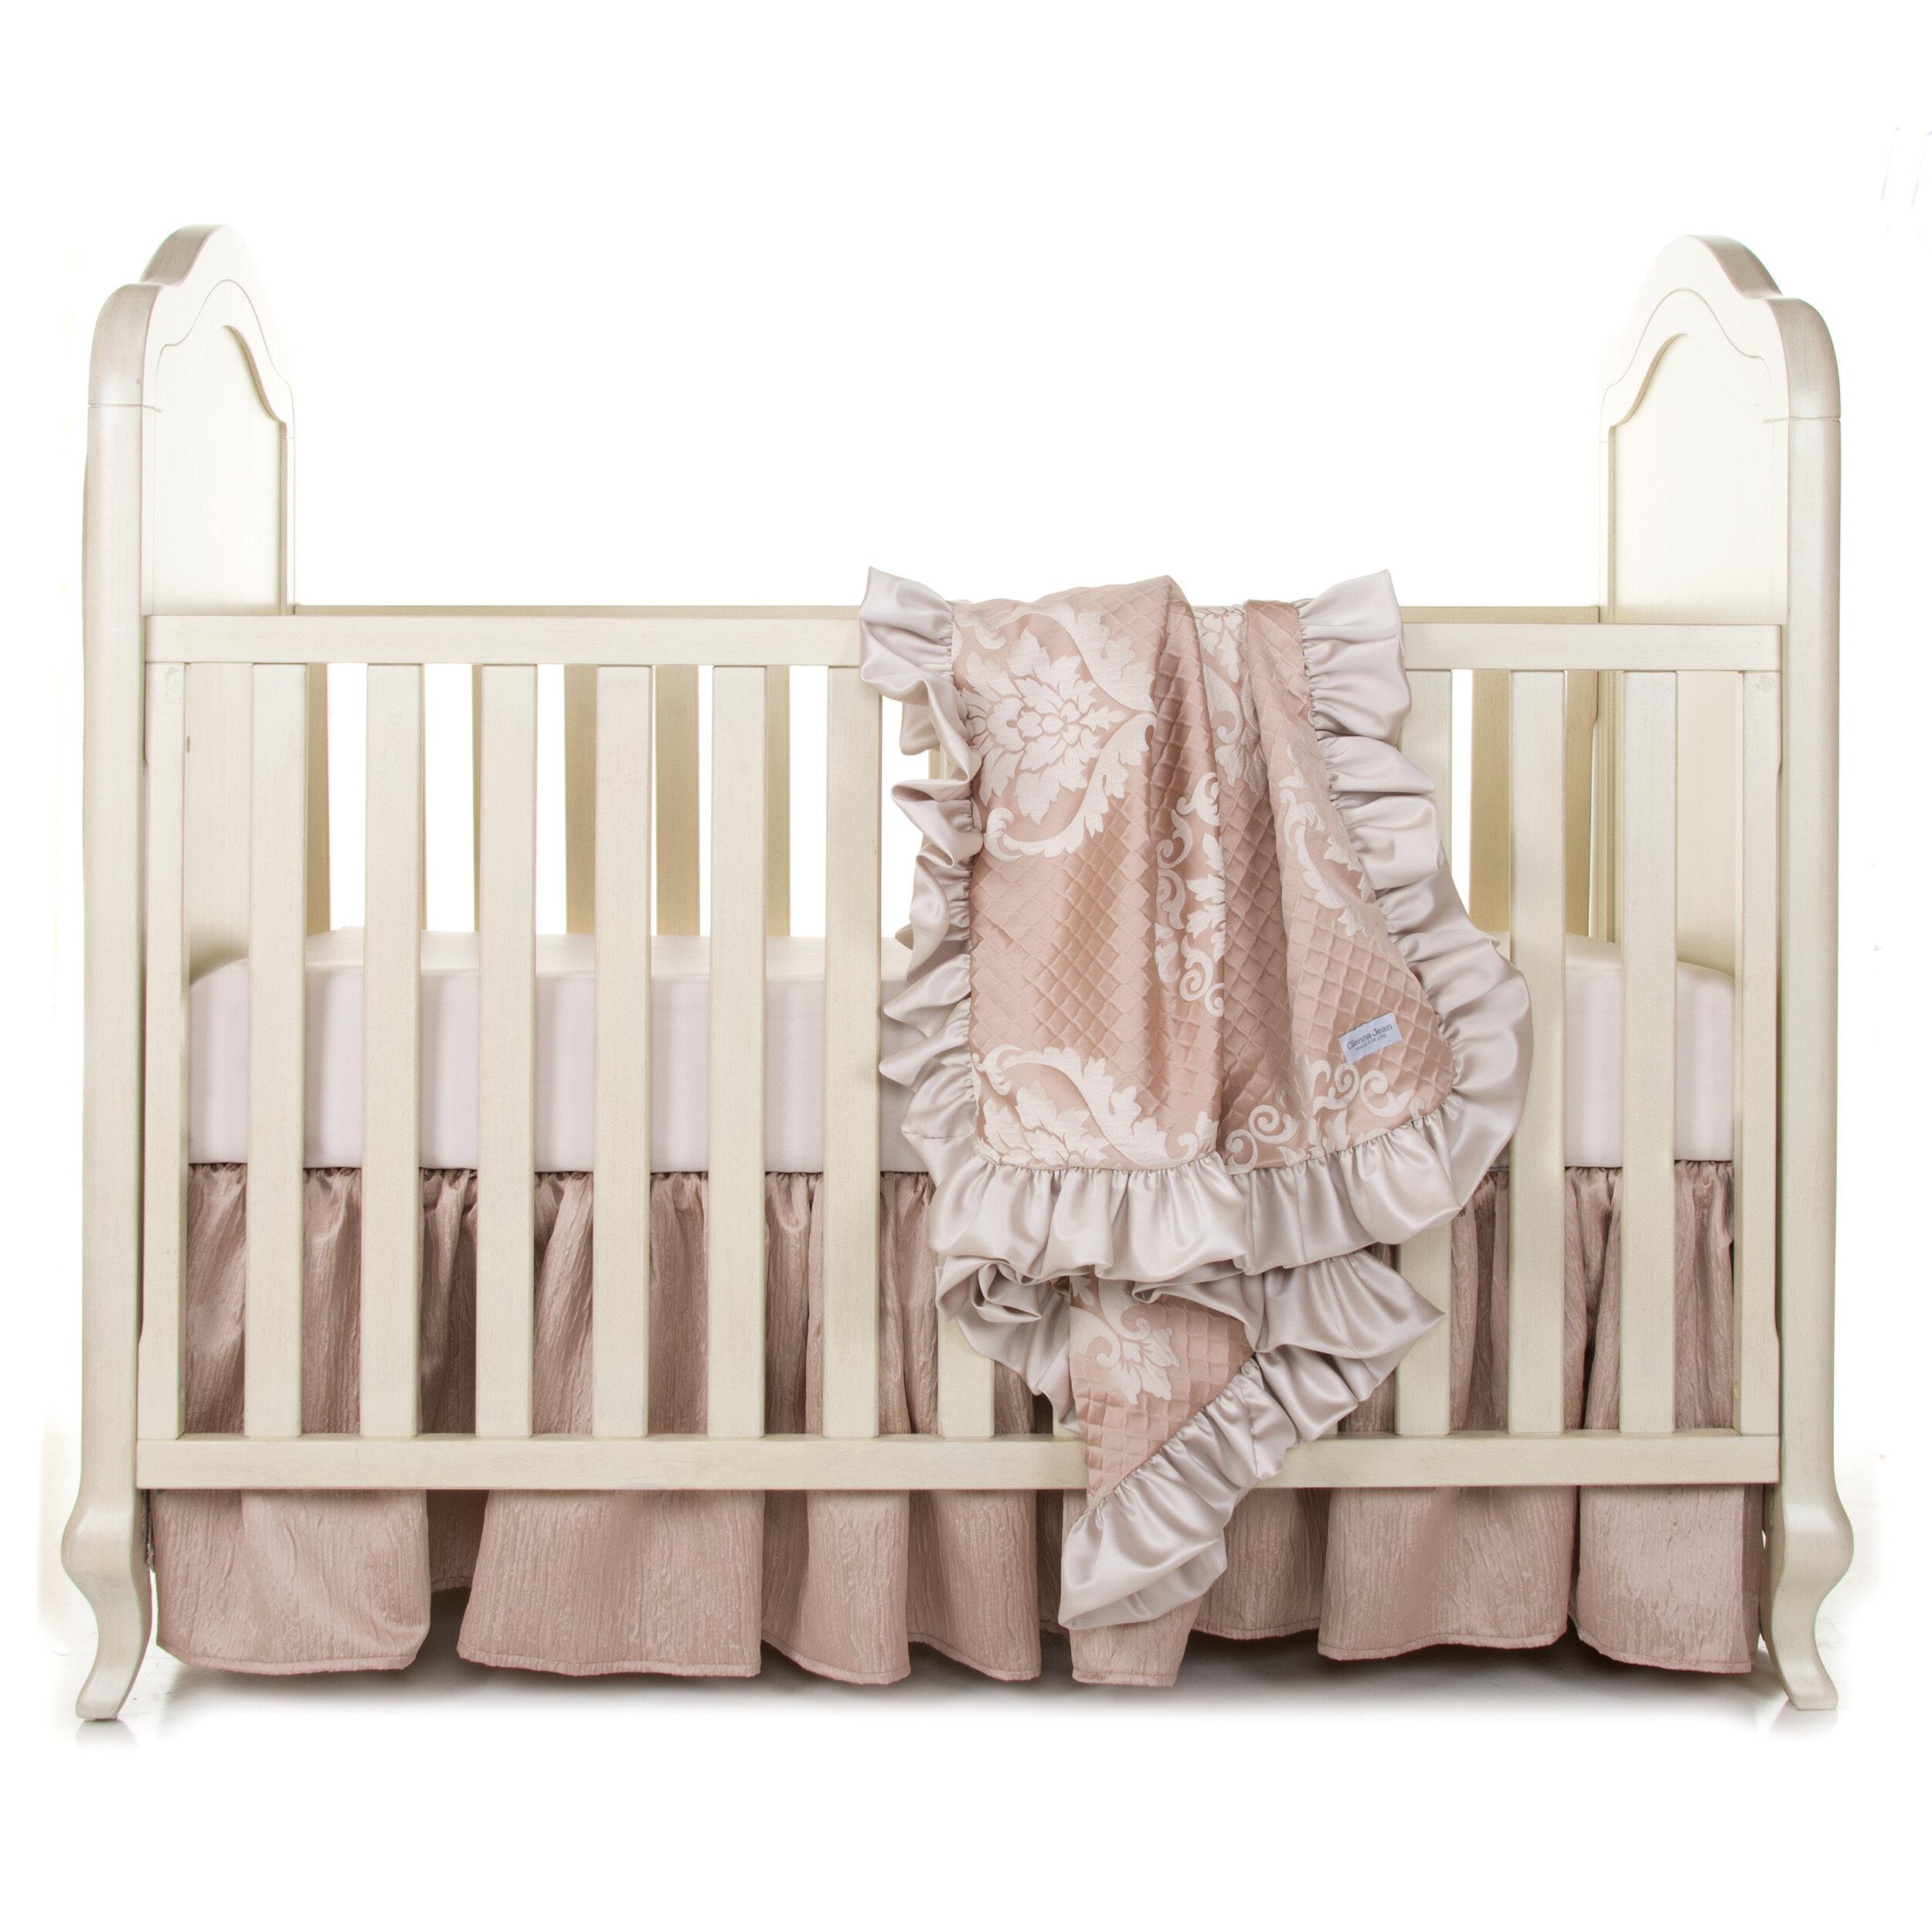 Zoomie Kids Hollander 3 Piece Crib Bedding Set Reviews Wayfair